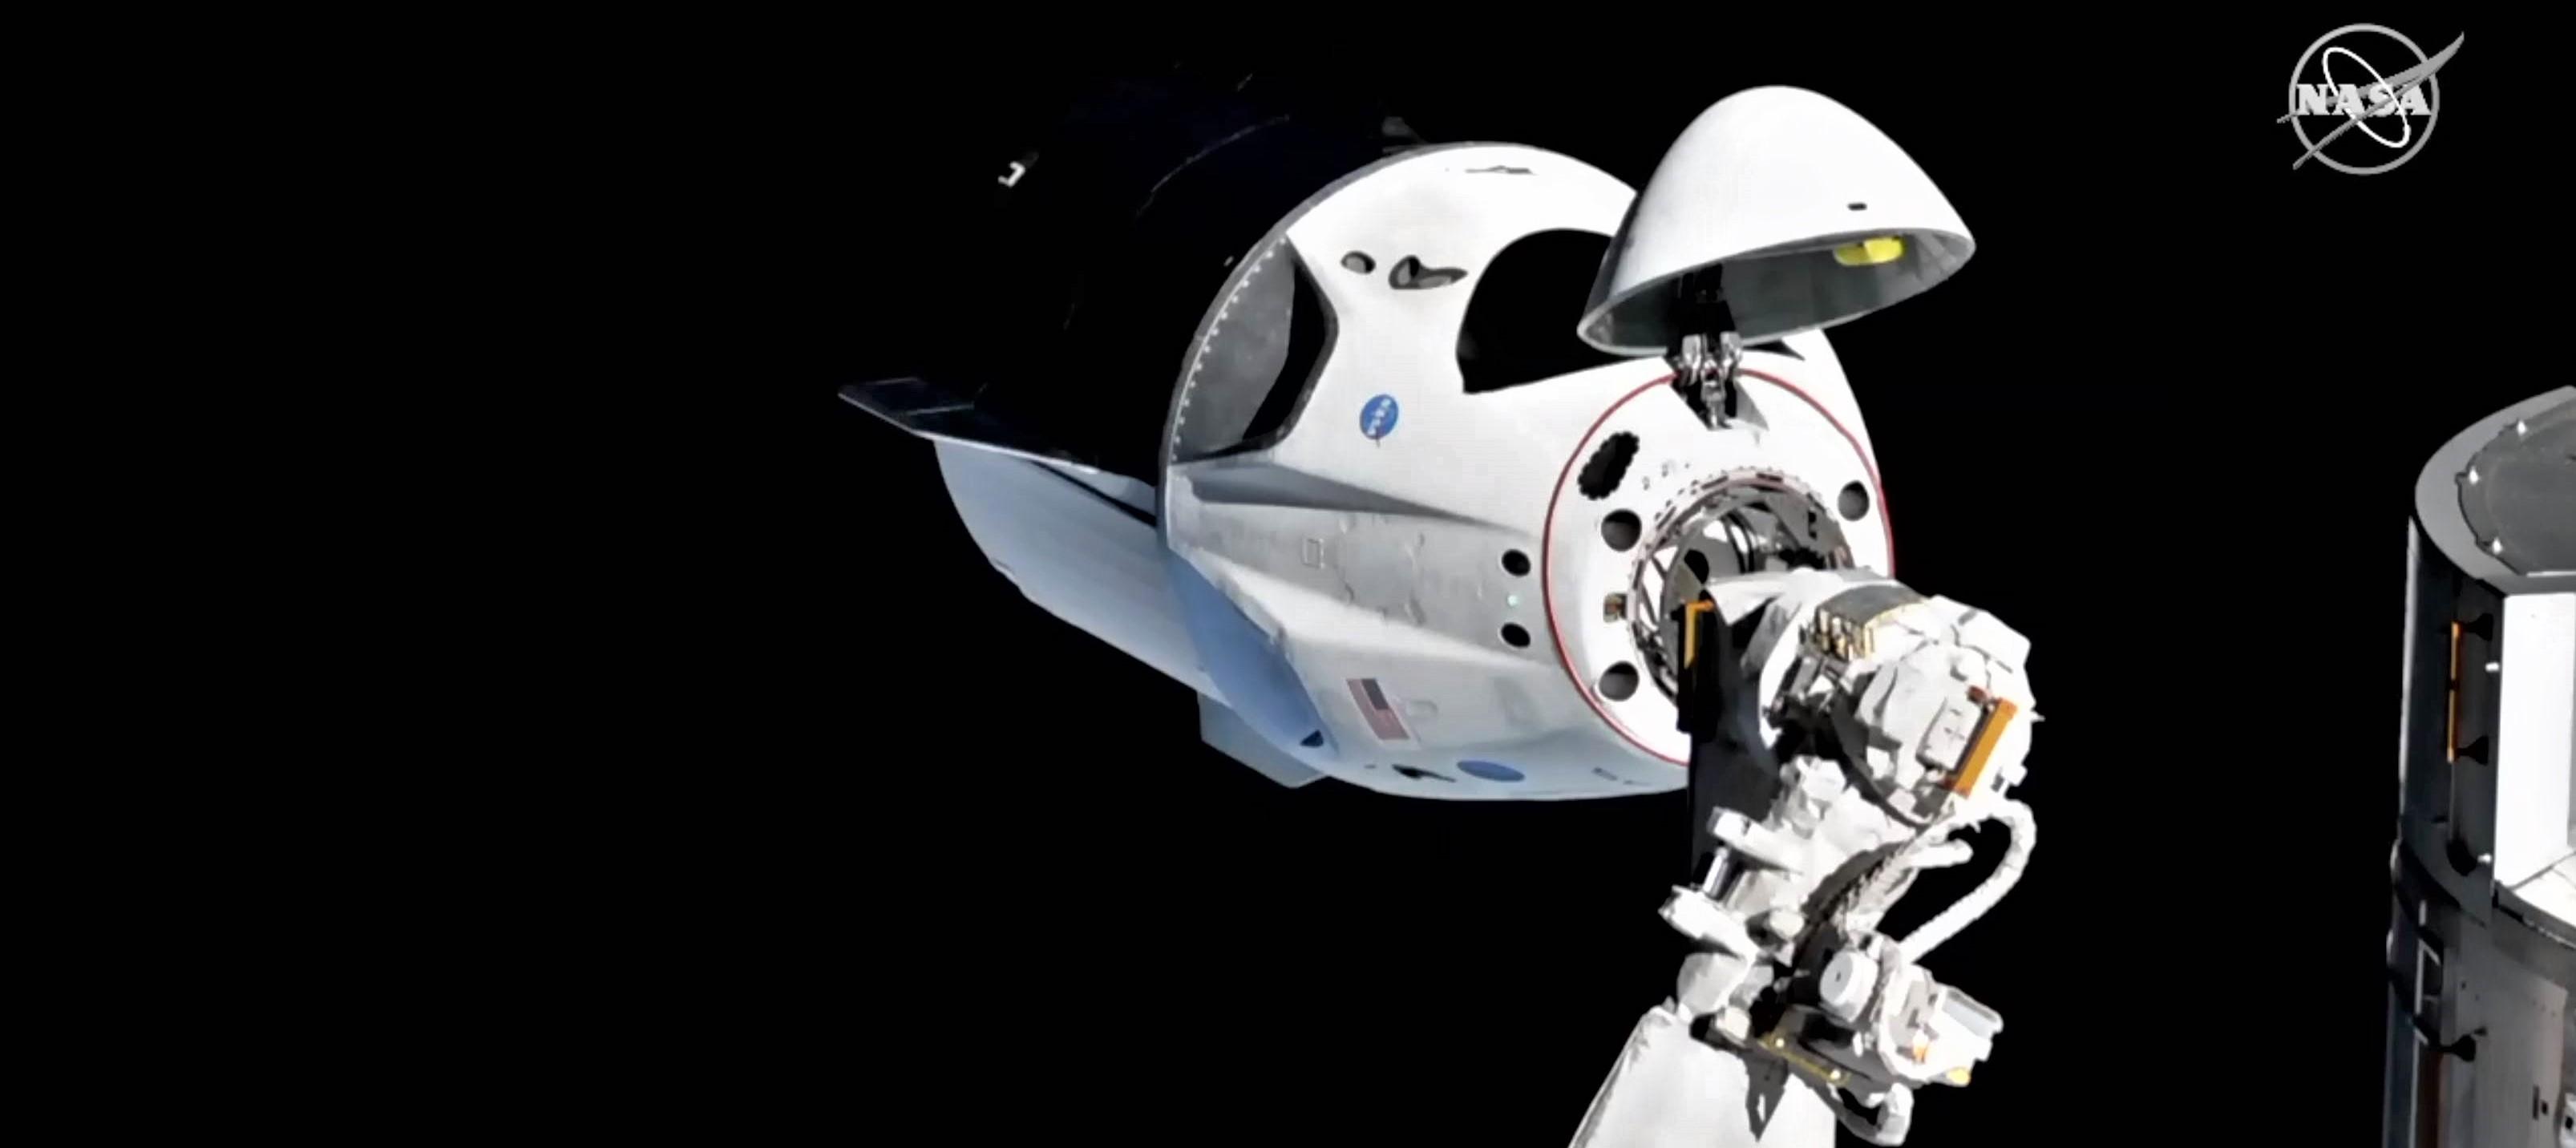 Crew Dragon DM-1 ISS arrival 030319 (NASA) 4 edit